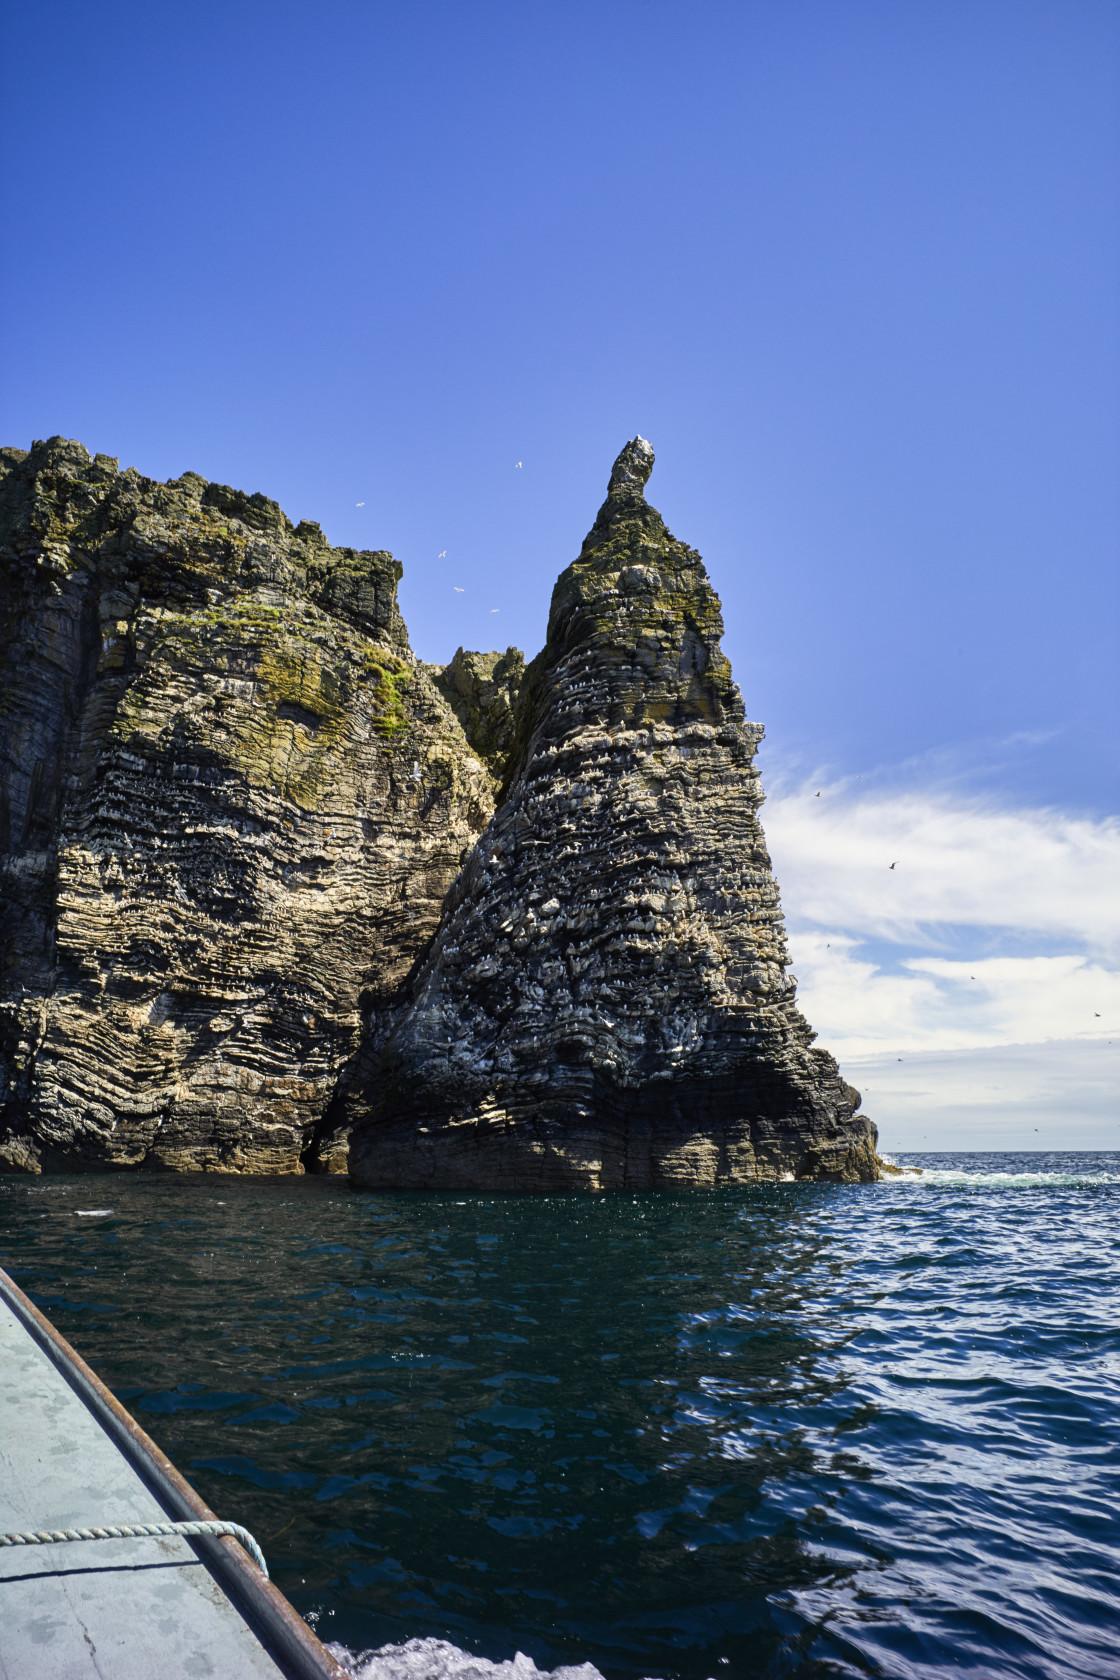 """Sugarloaf rock at the Chasms, Isle of Man"" stock image"